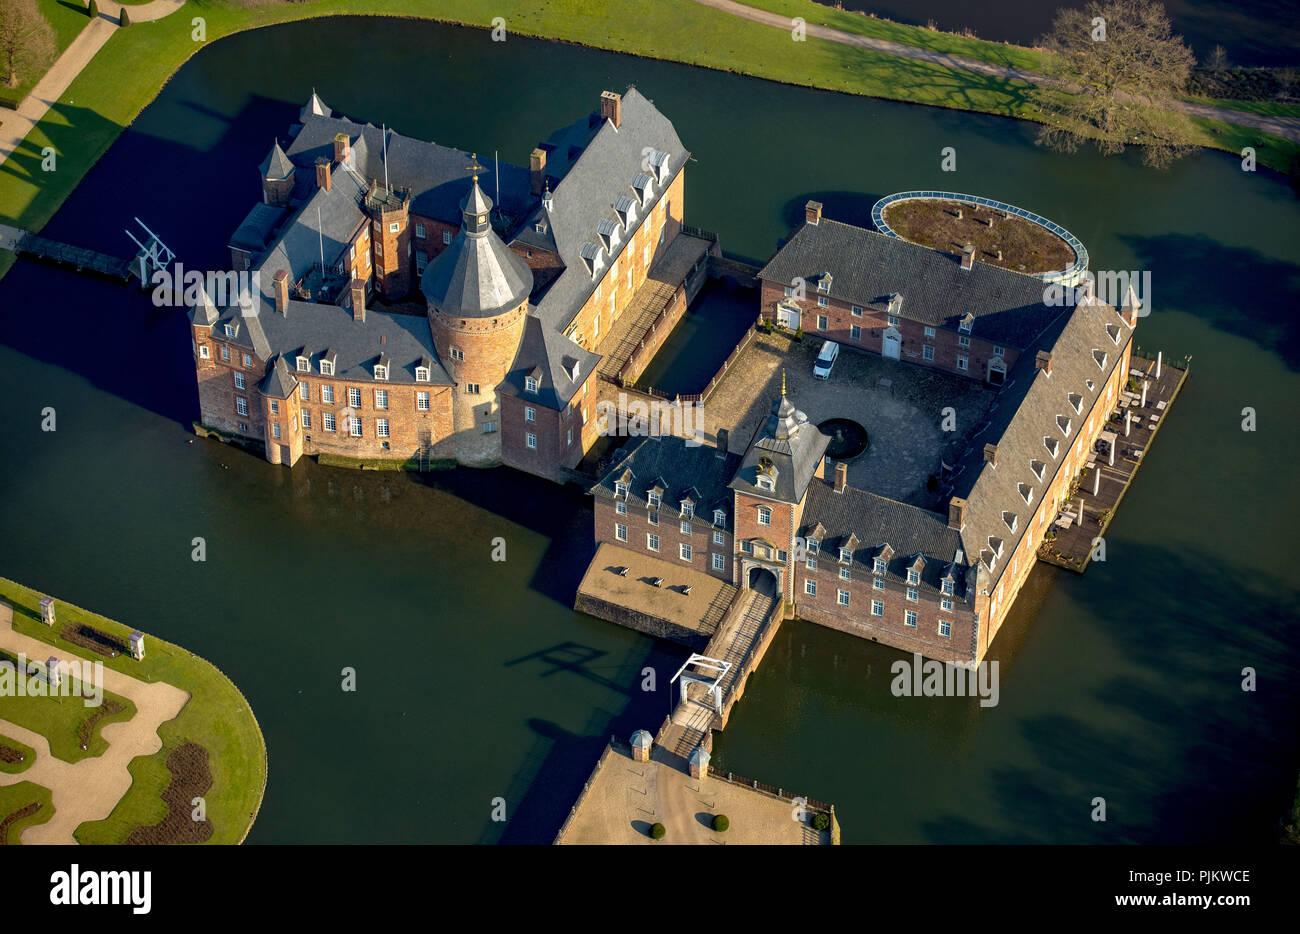 Museum water castle Anholt, Romantik Parkhotel water castle Anholt, Castle, Isselburg, Isselburg, Lower Rhine, North Rhine-Westphalia, Germany - Stock Image